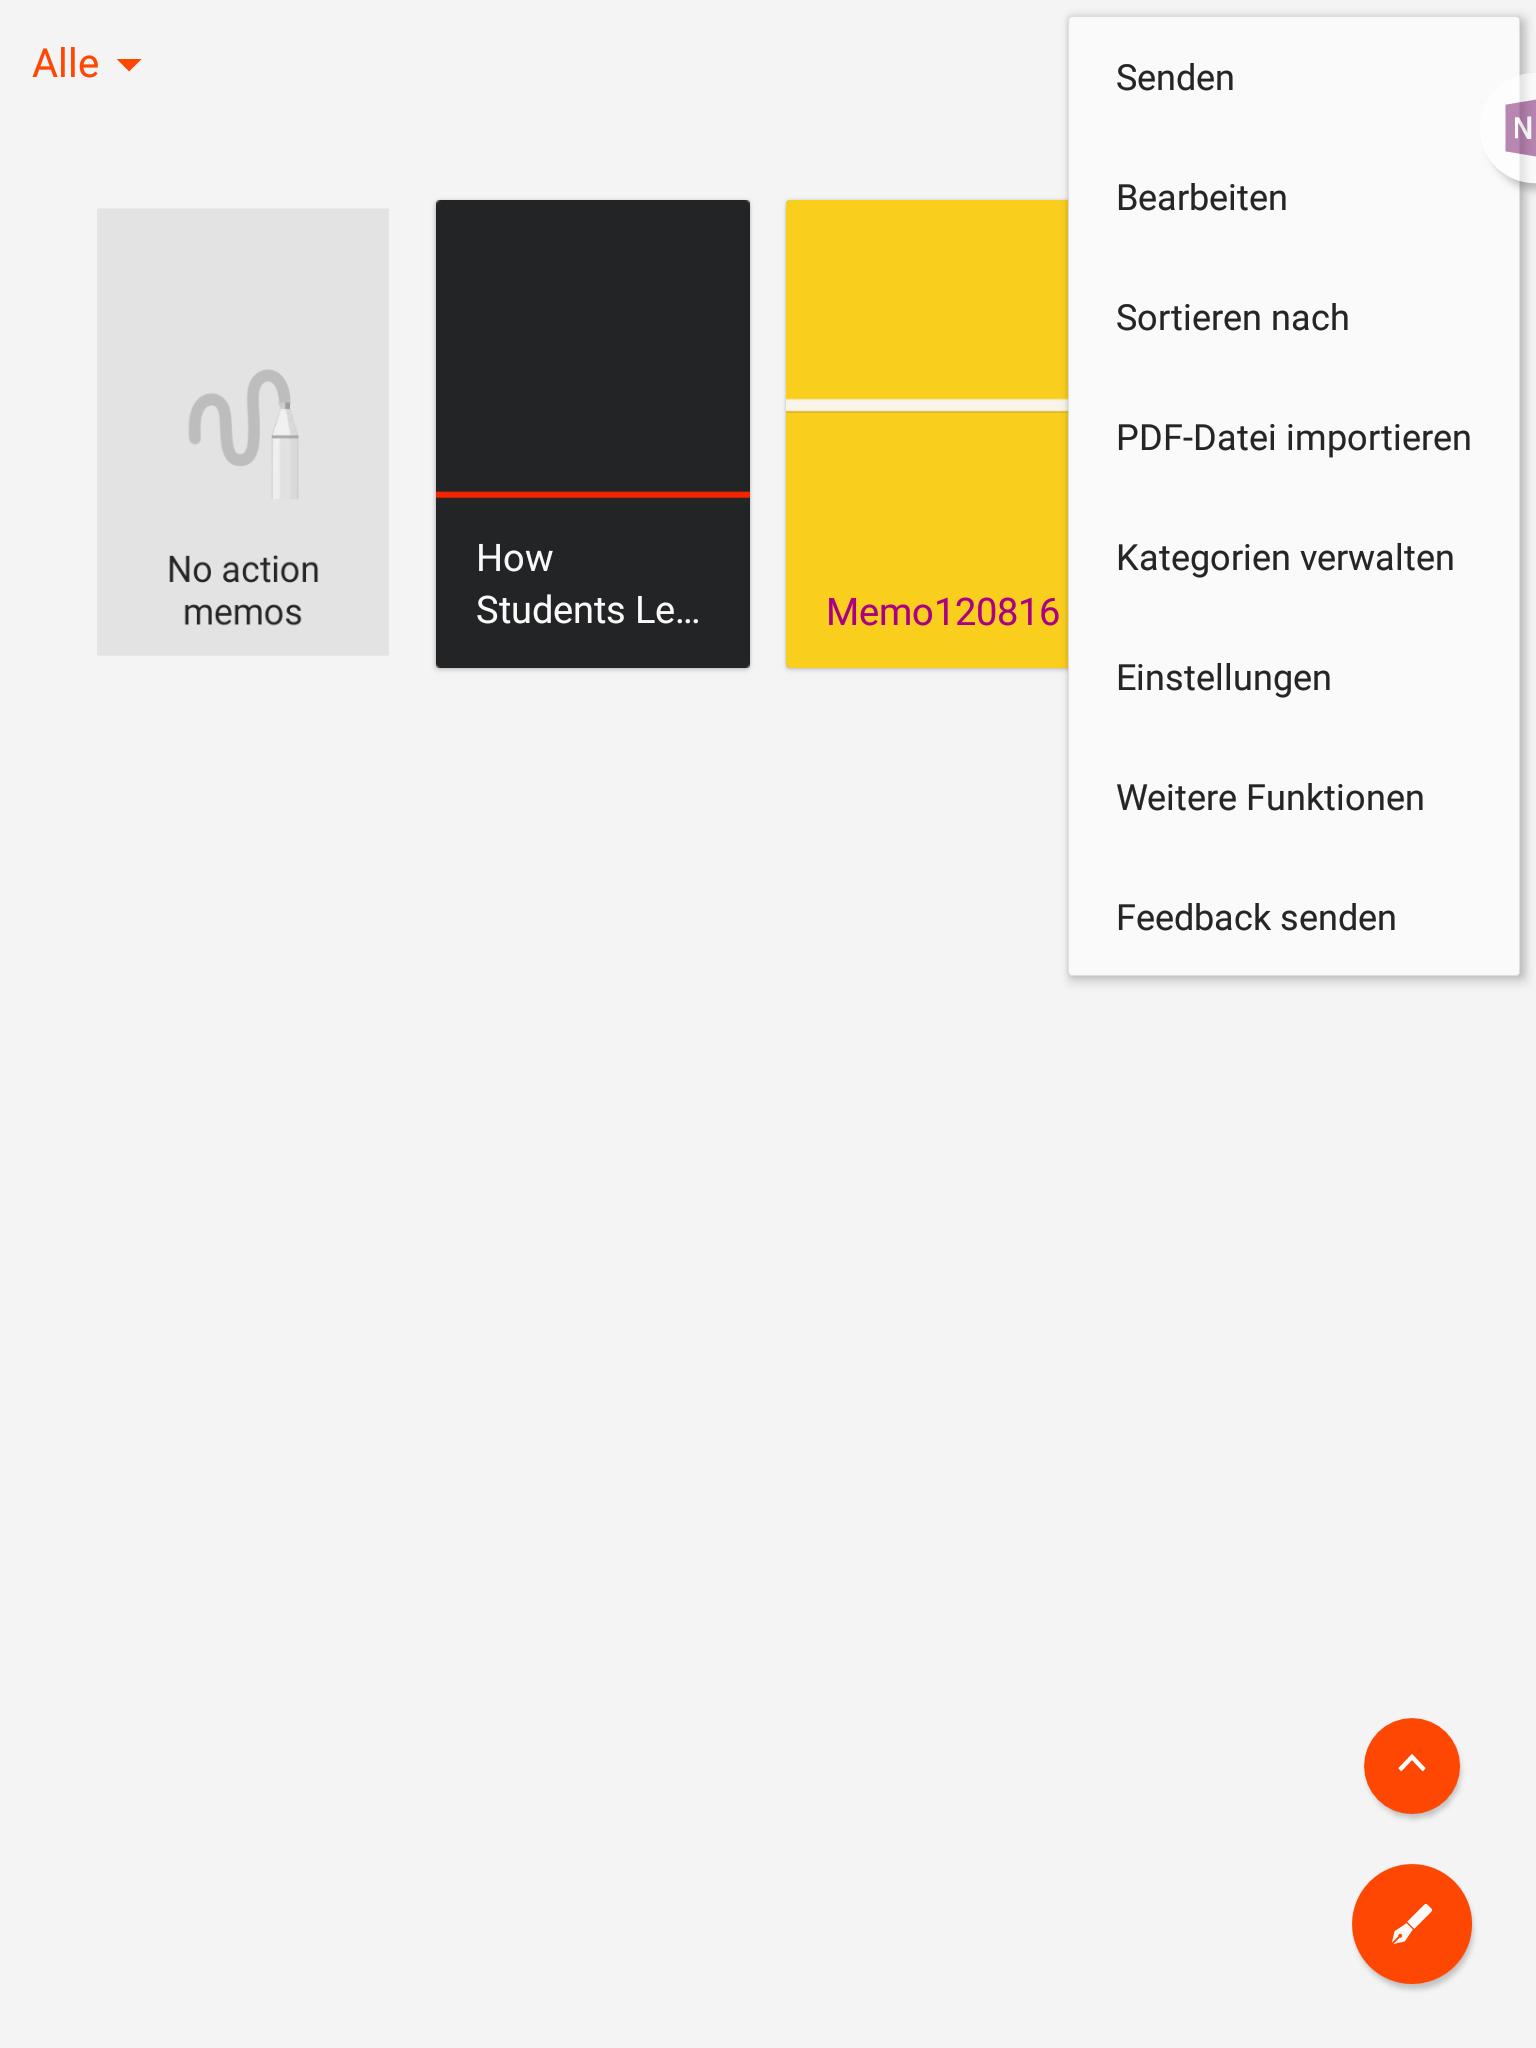 PDF importieren